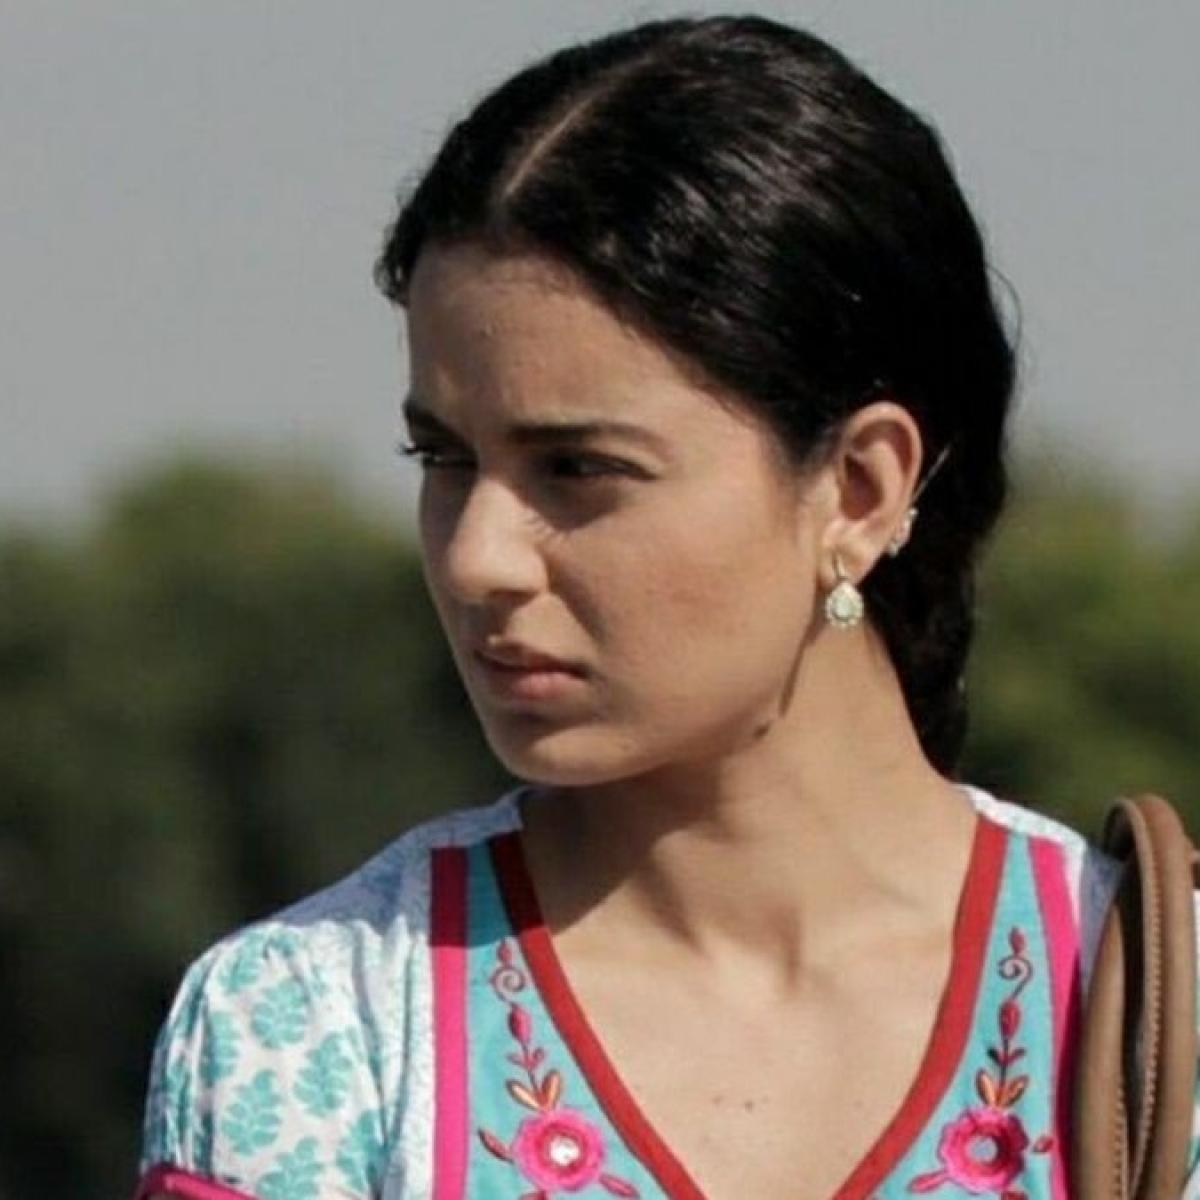 Kangana Ranaut's Twitter suspended: Swara Bhasker, Hansal Mehta, Richa Chadha and other Bollywood celebs react